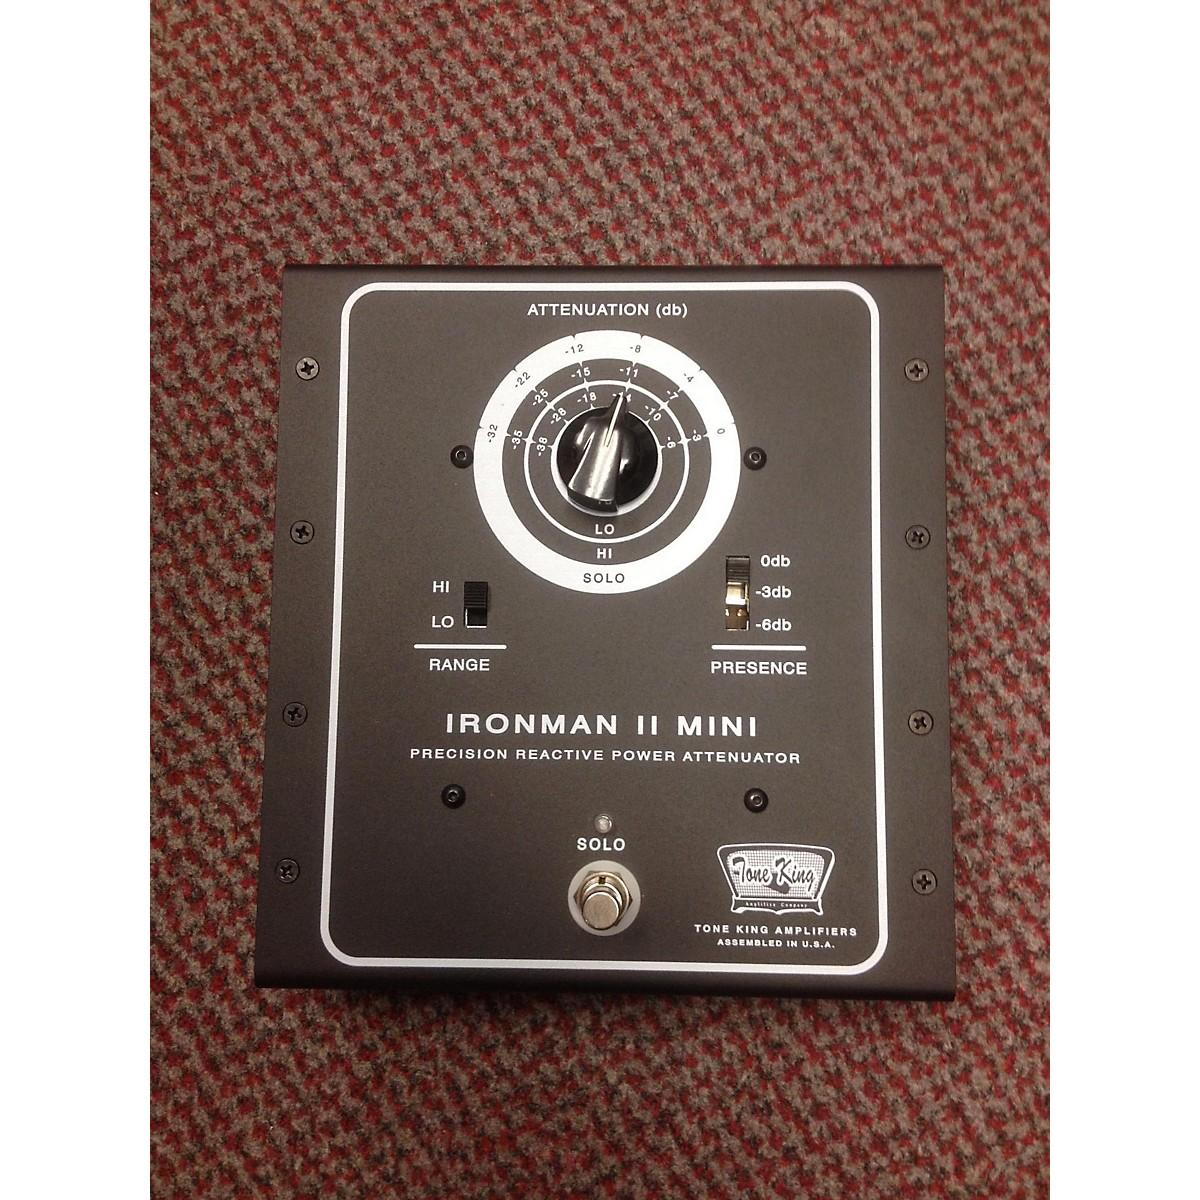 Tone King Iron Man II Mini Attenuator Signal Processor